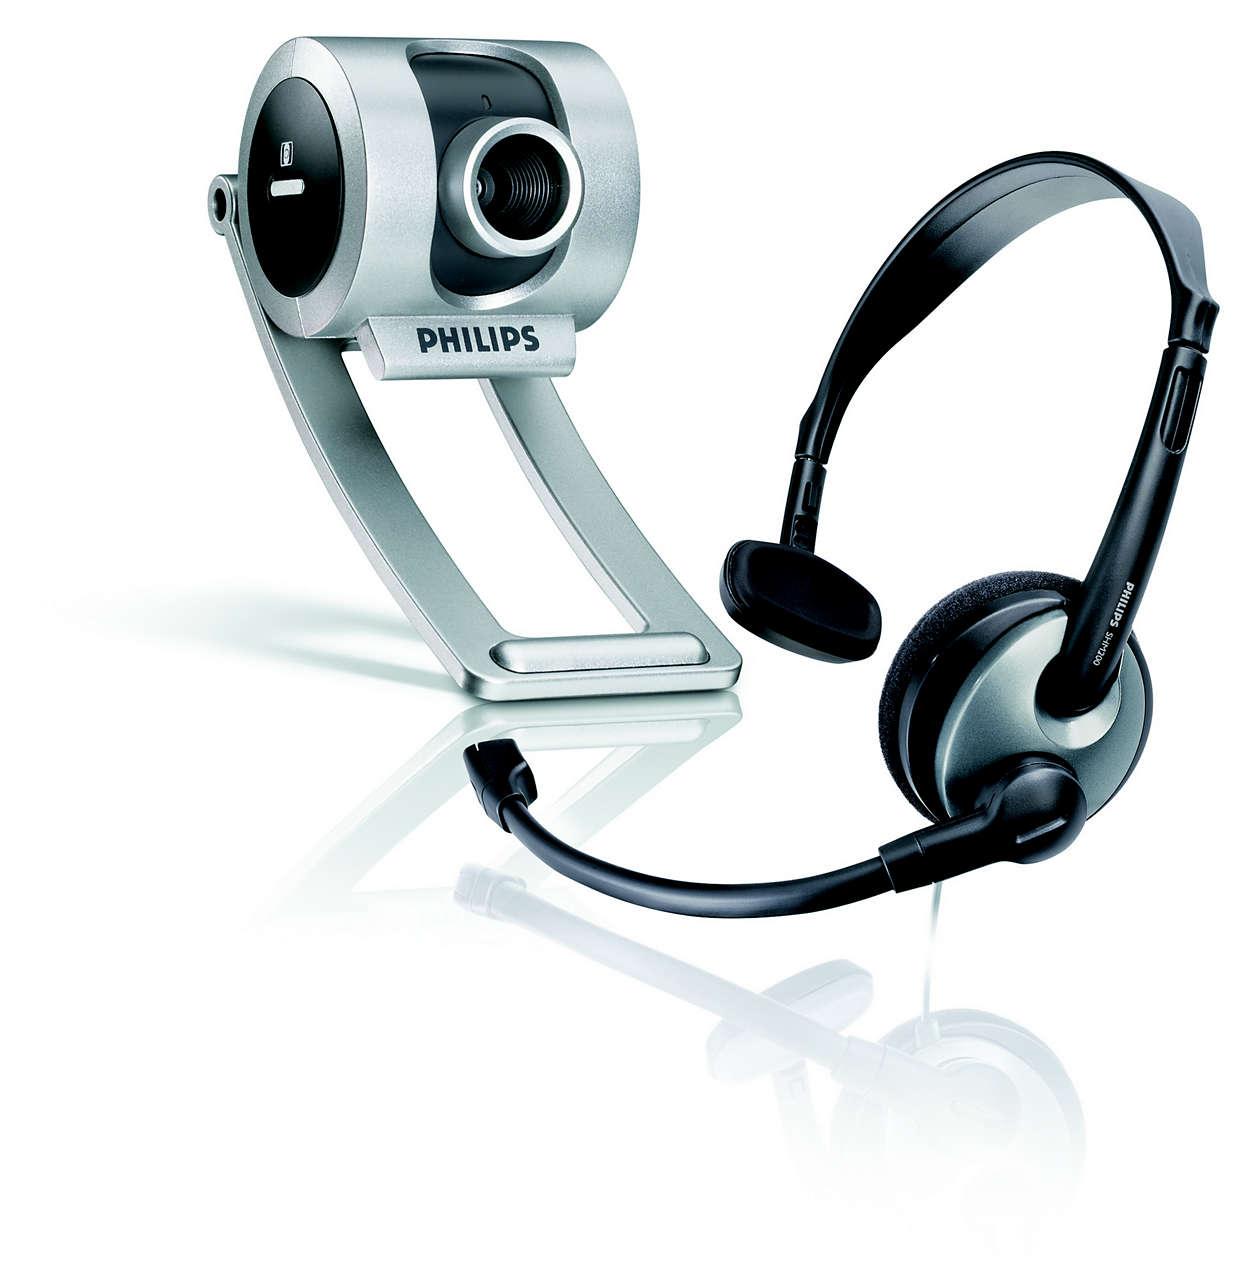 Chats mit Skype